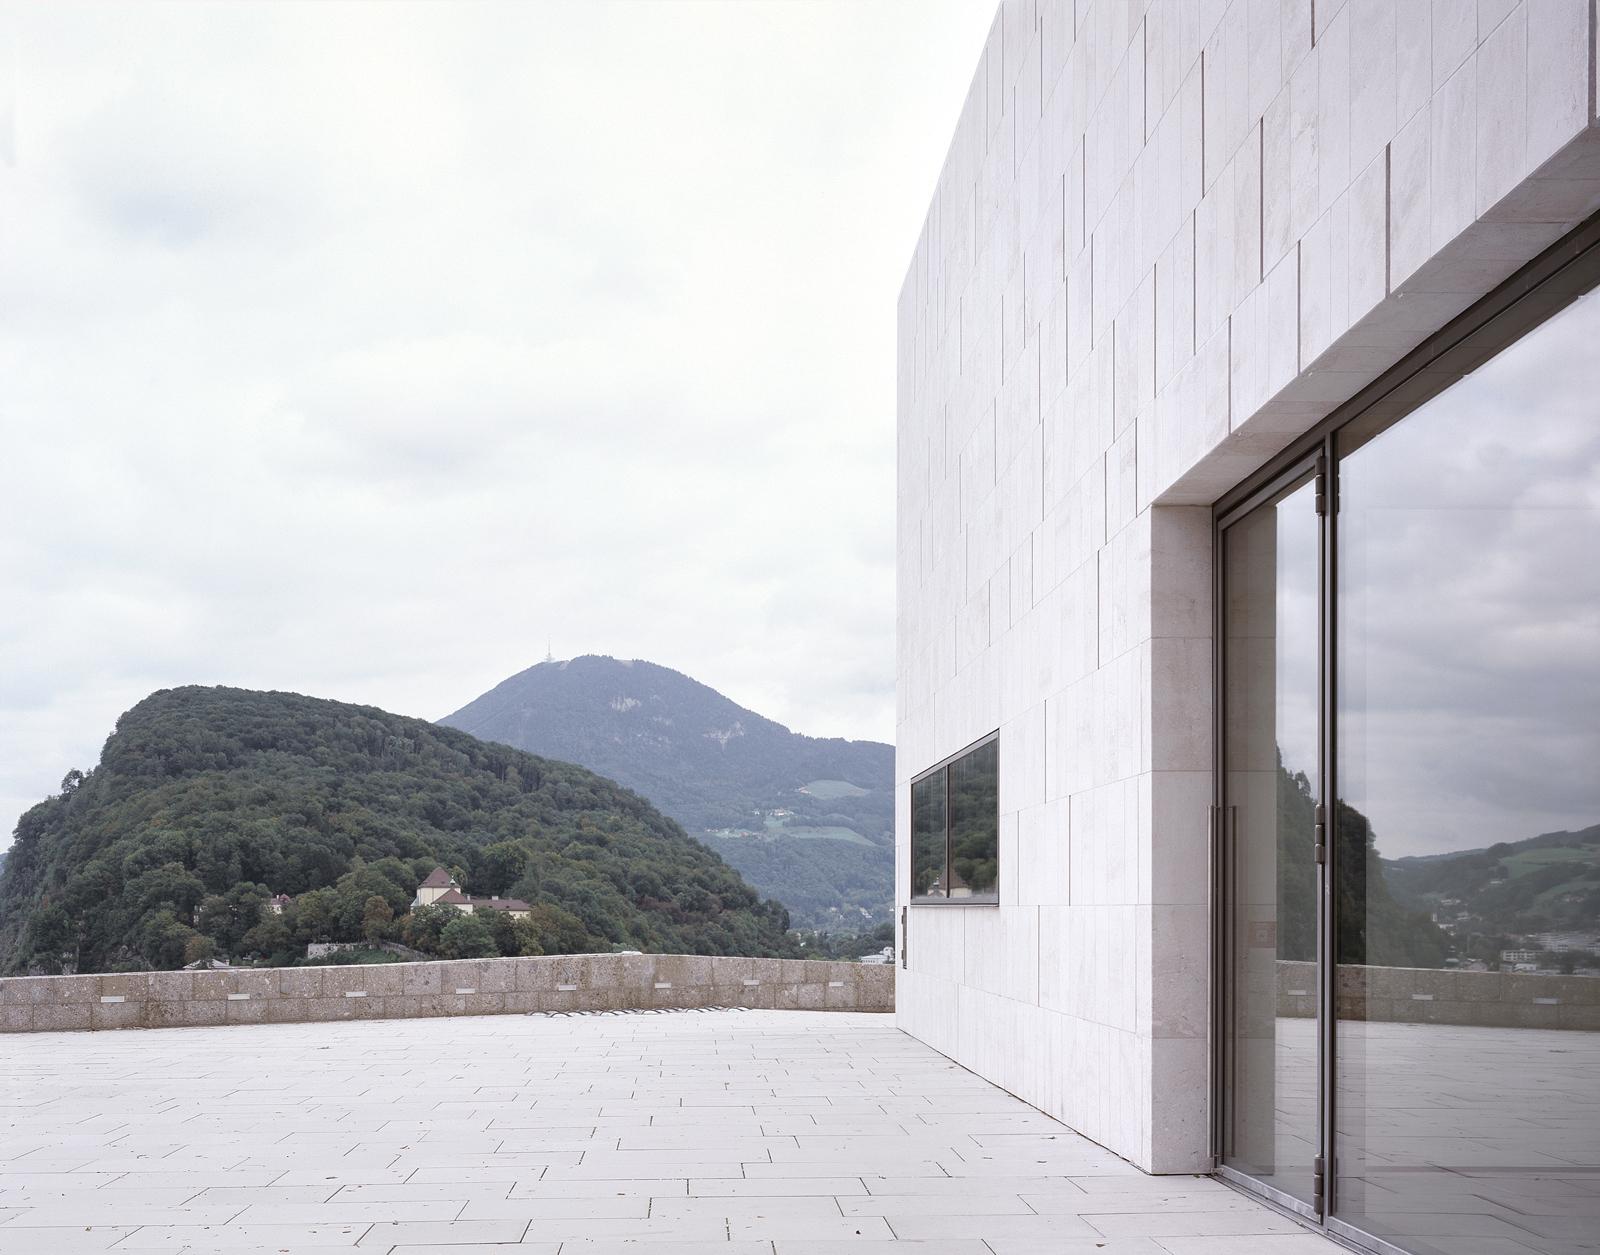 Skulpturenhof mit Blick auf Kapuzinerberg